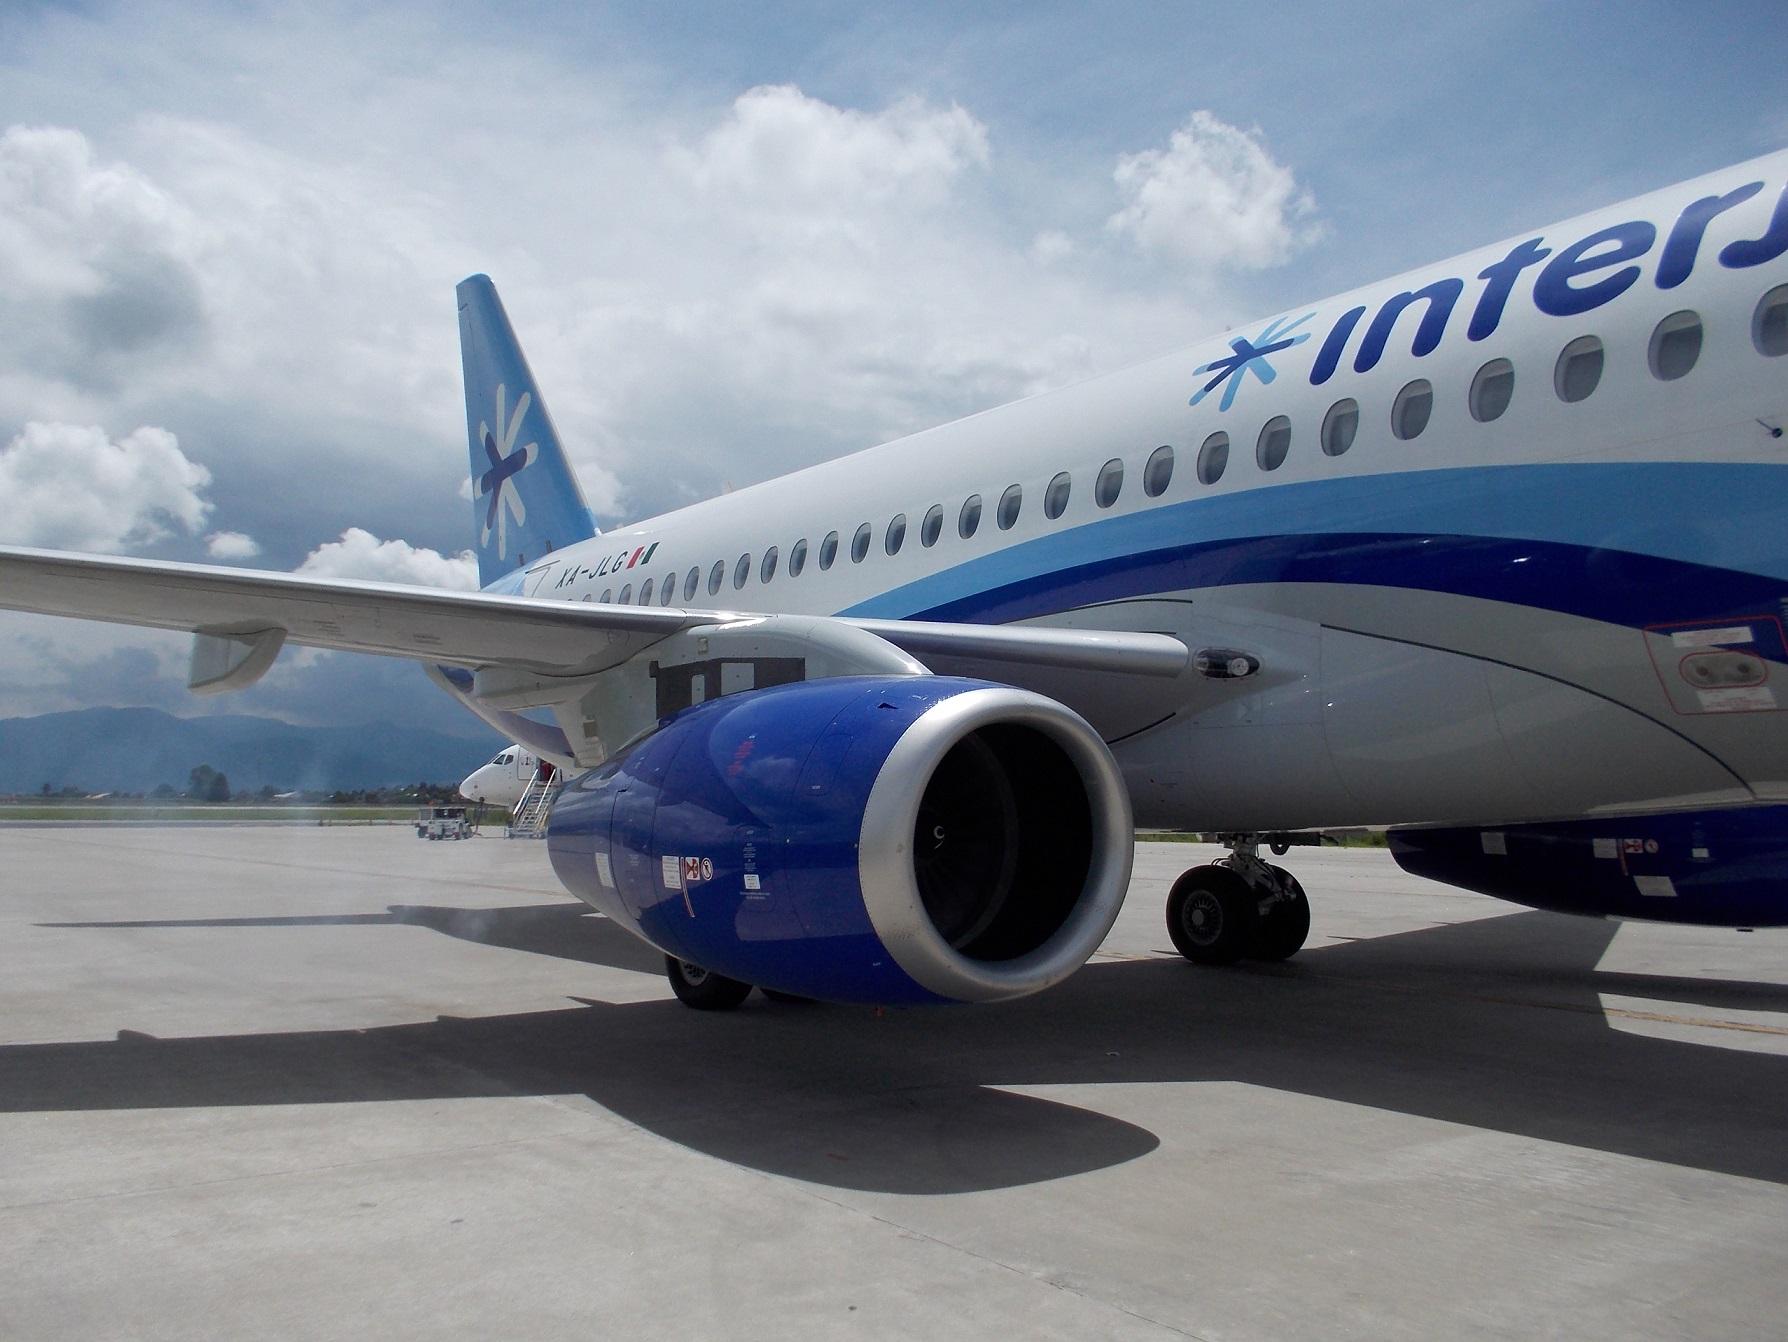 Interjet moderniza su flota de aviones